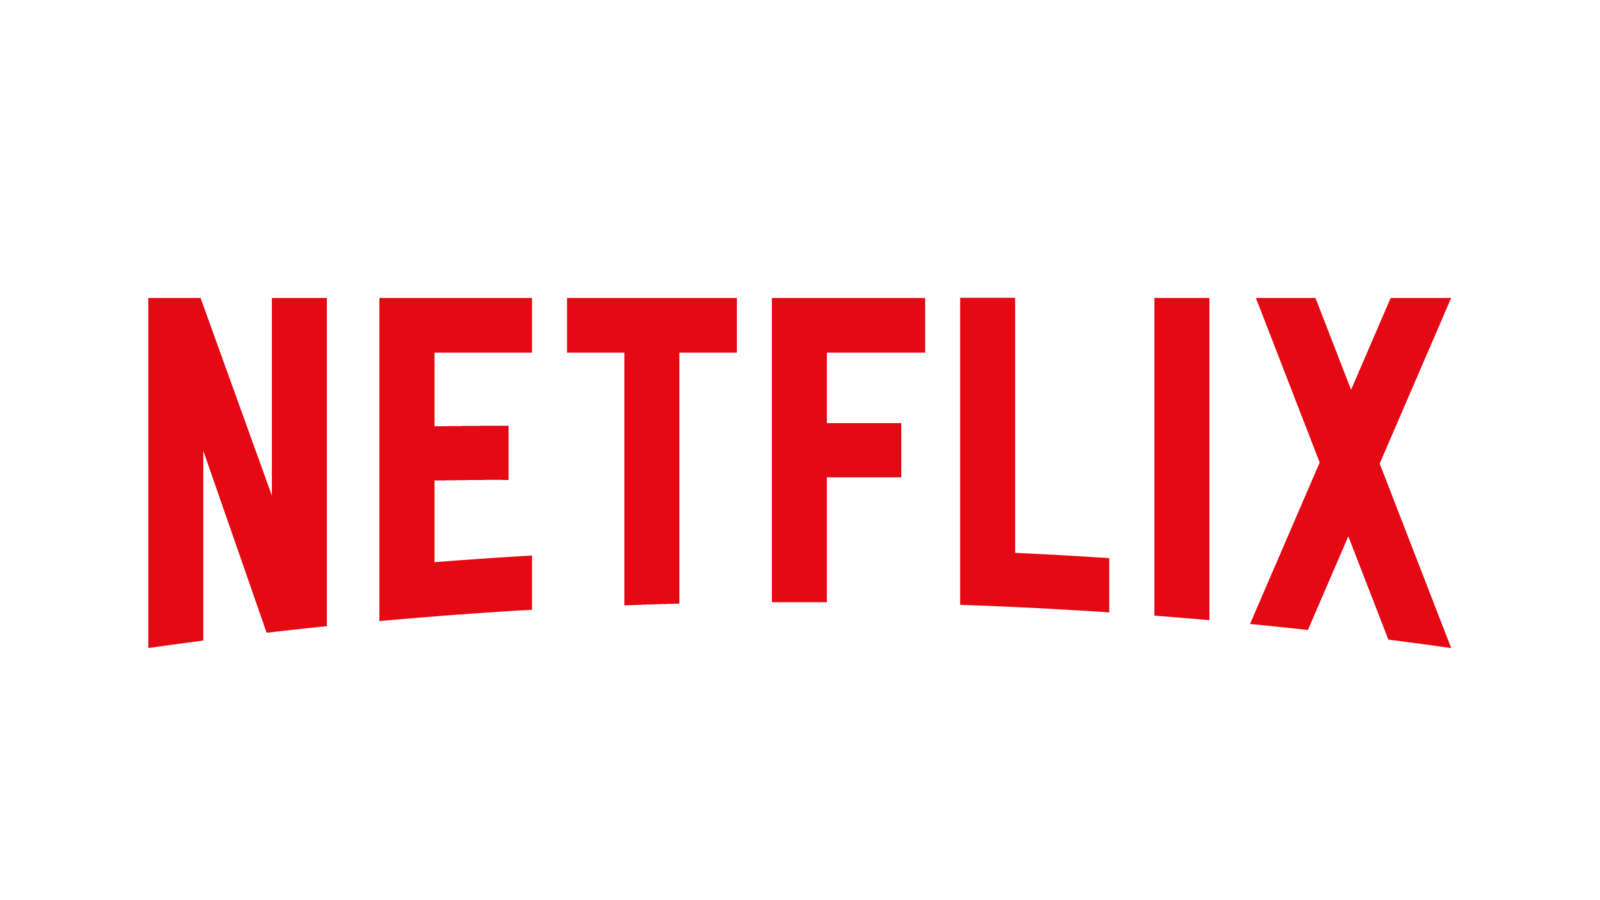 No Netflix in Indonesia